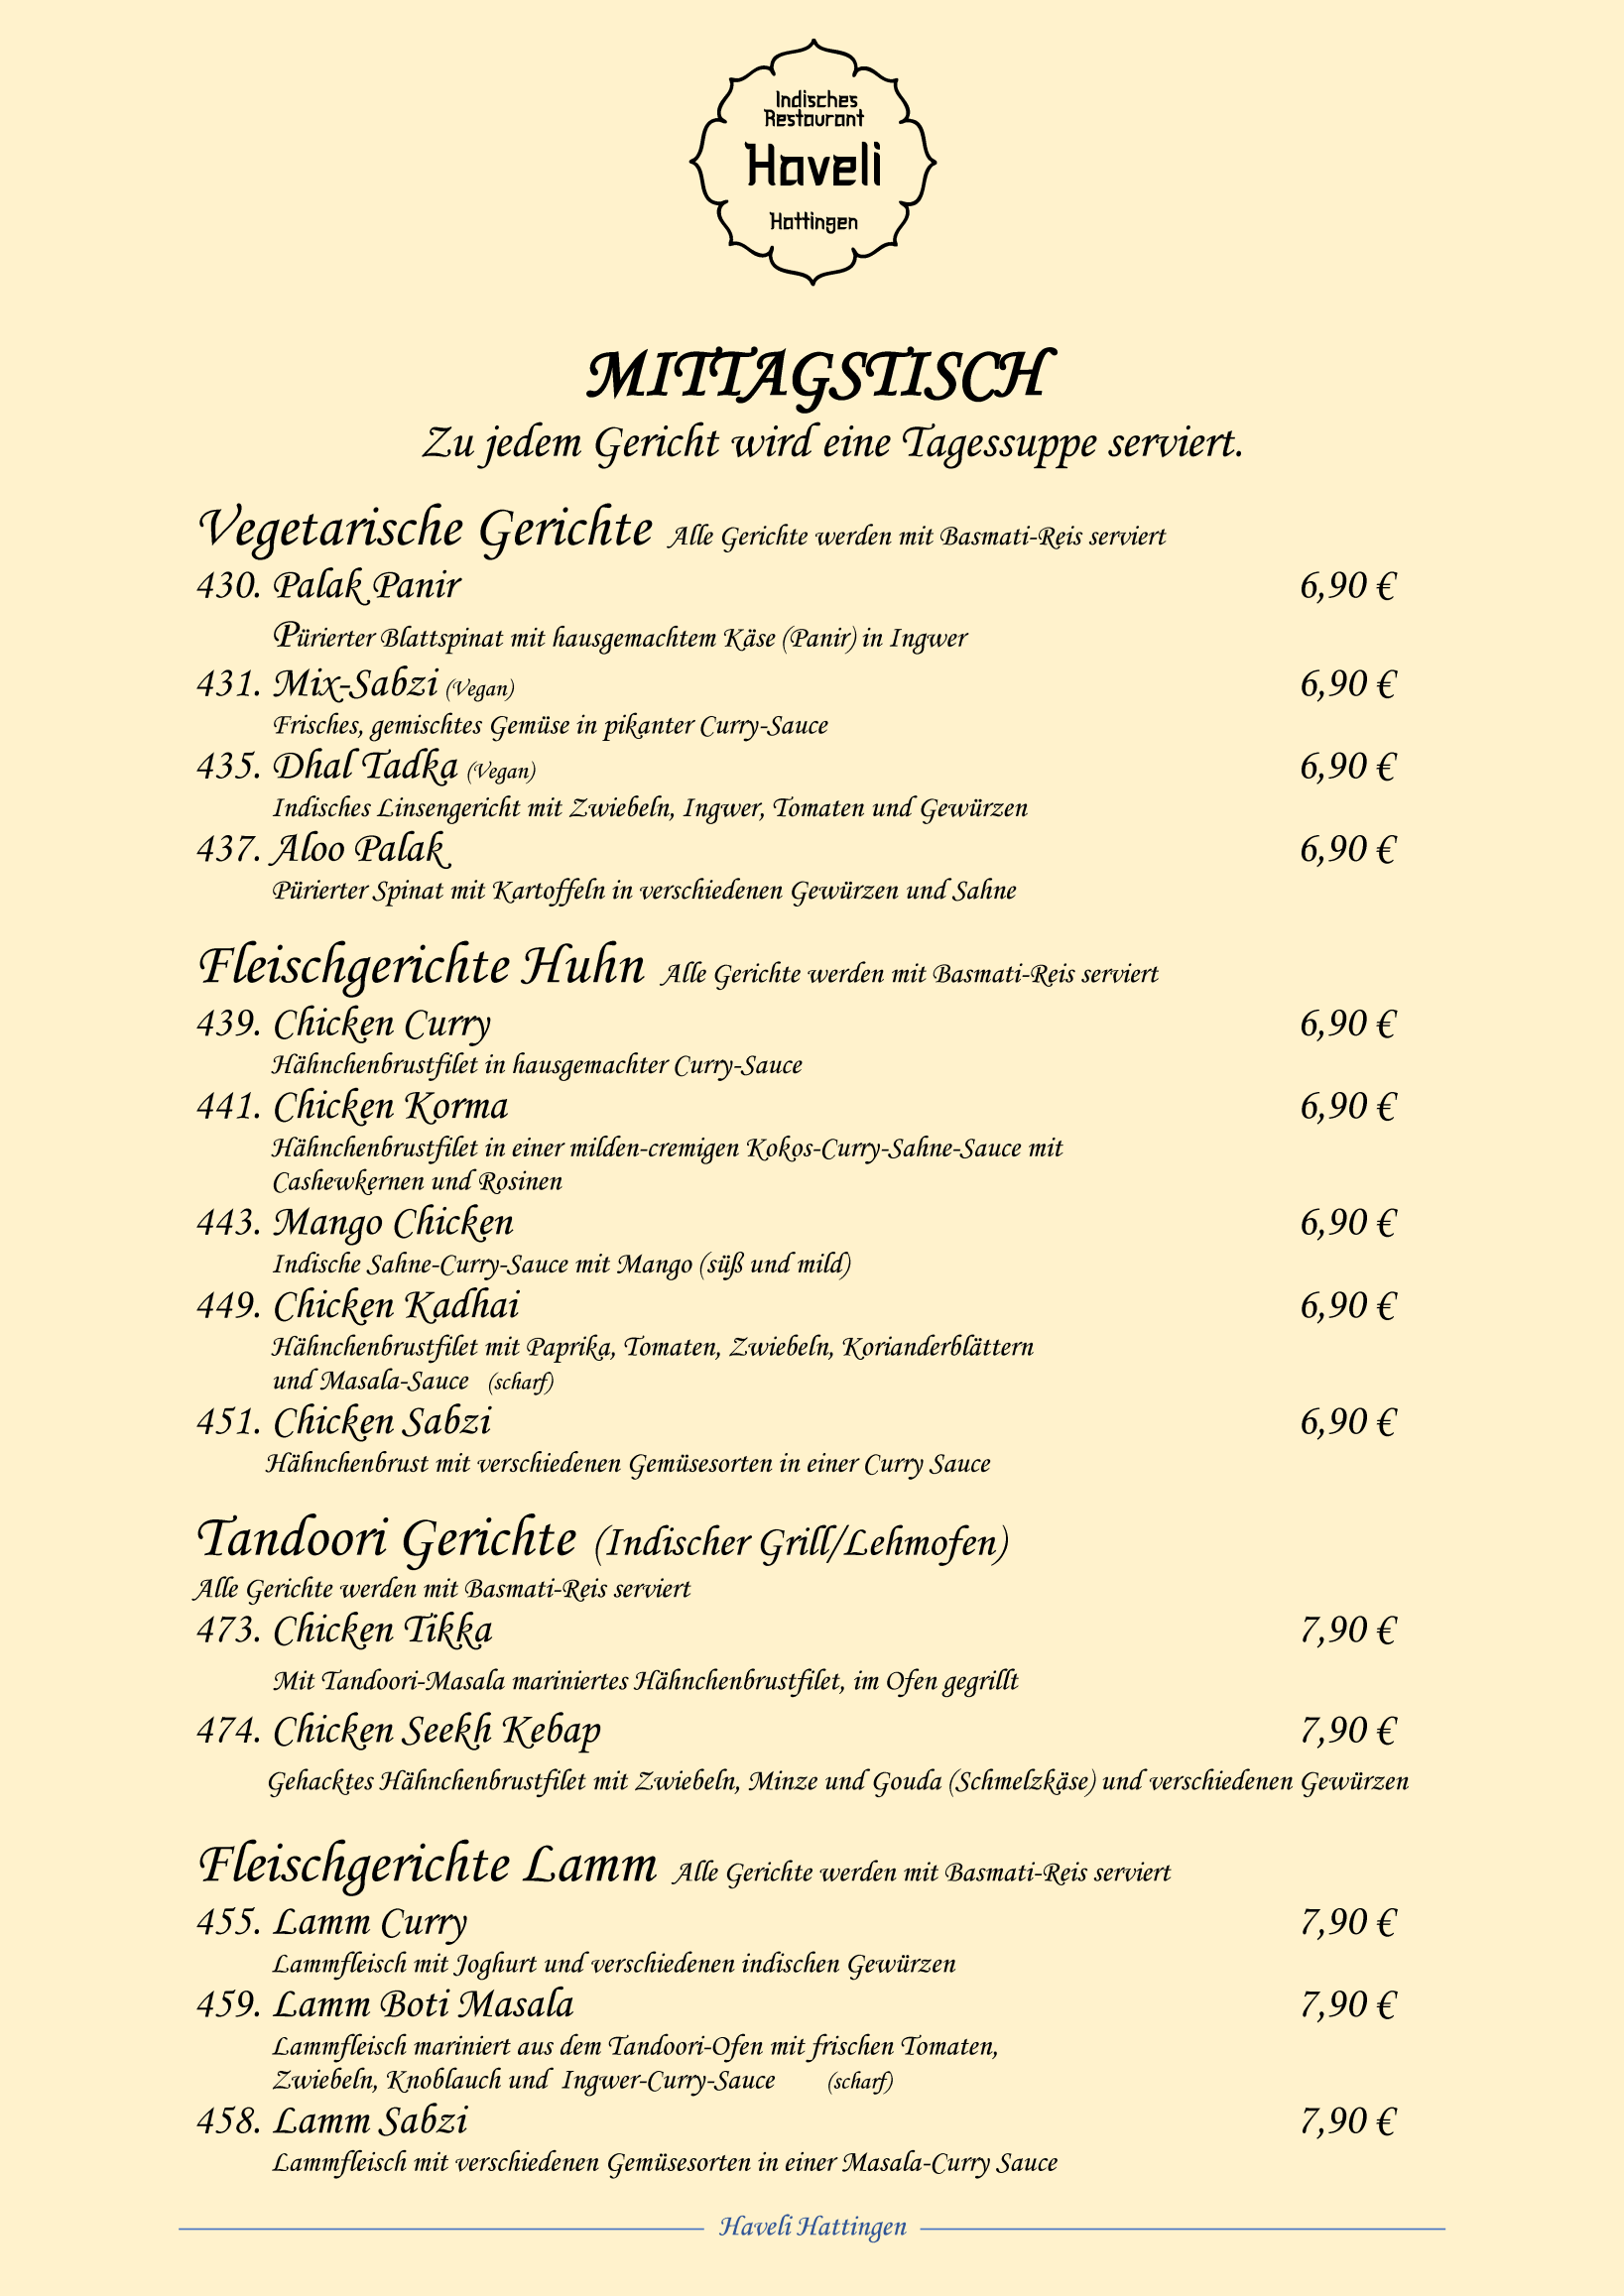 Restaurant Haveli Hattingen